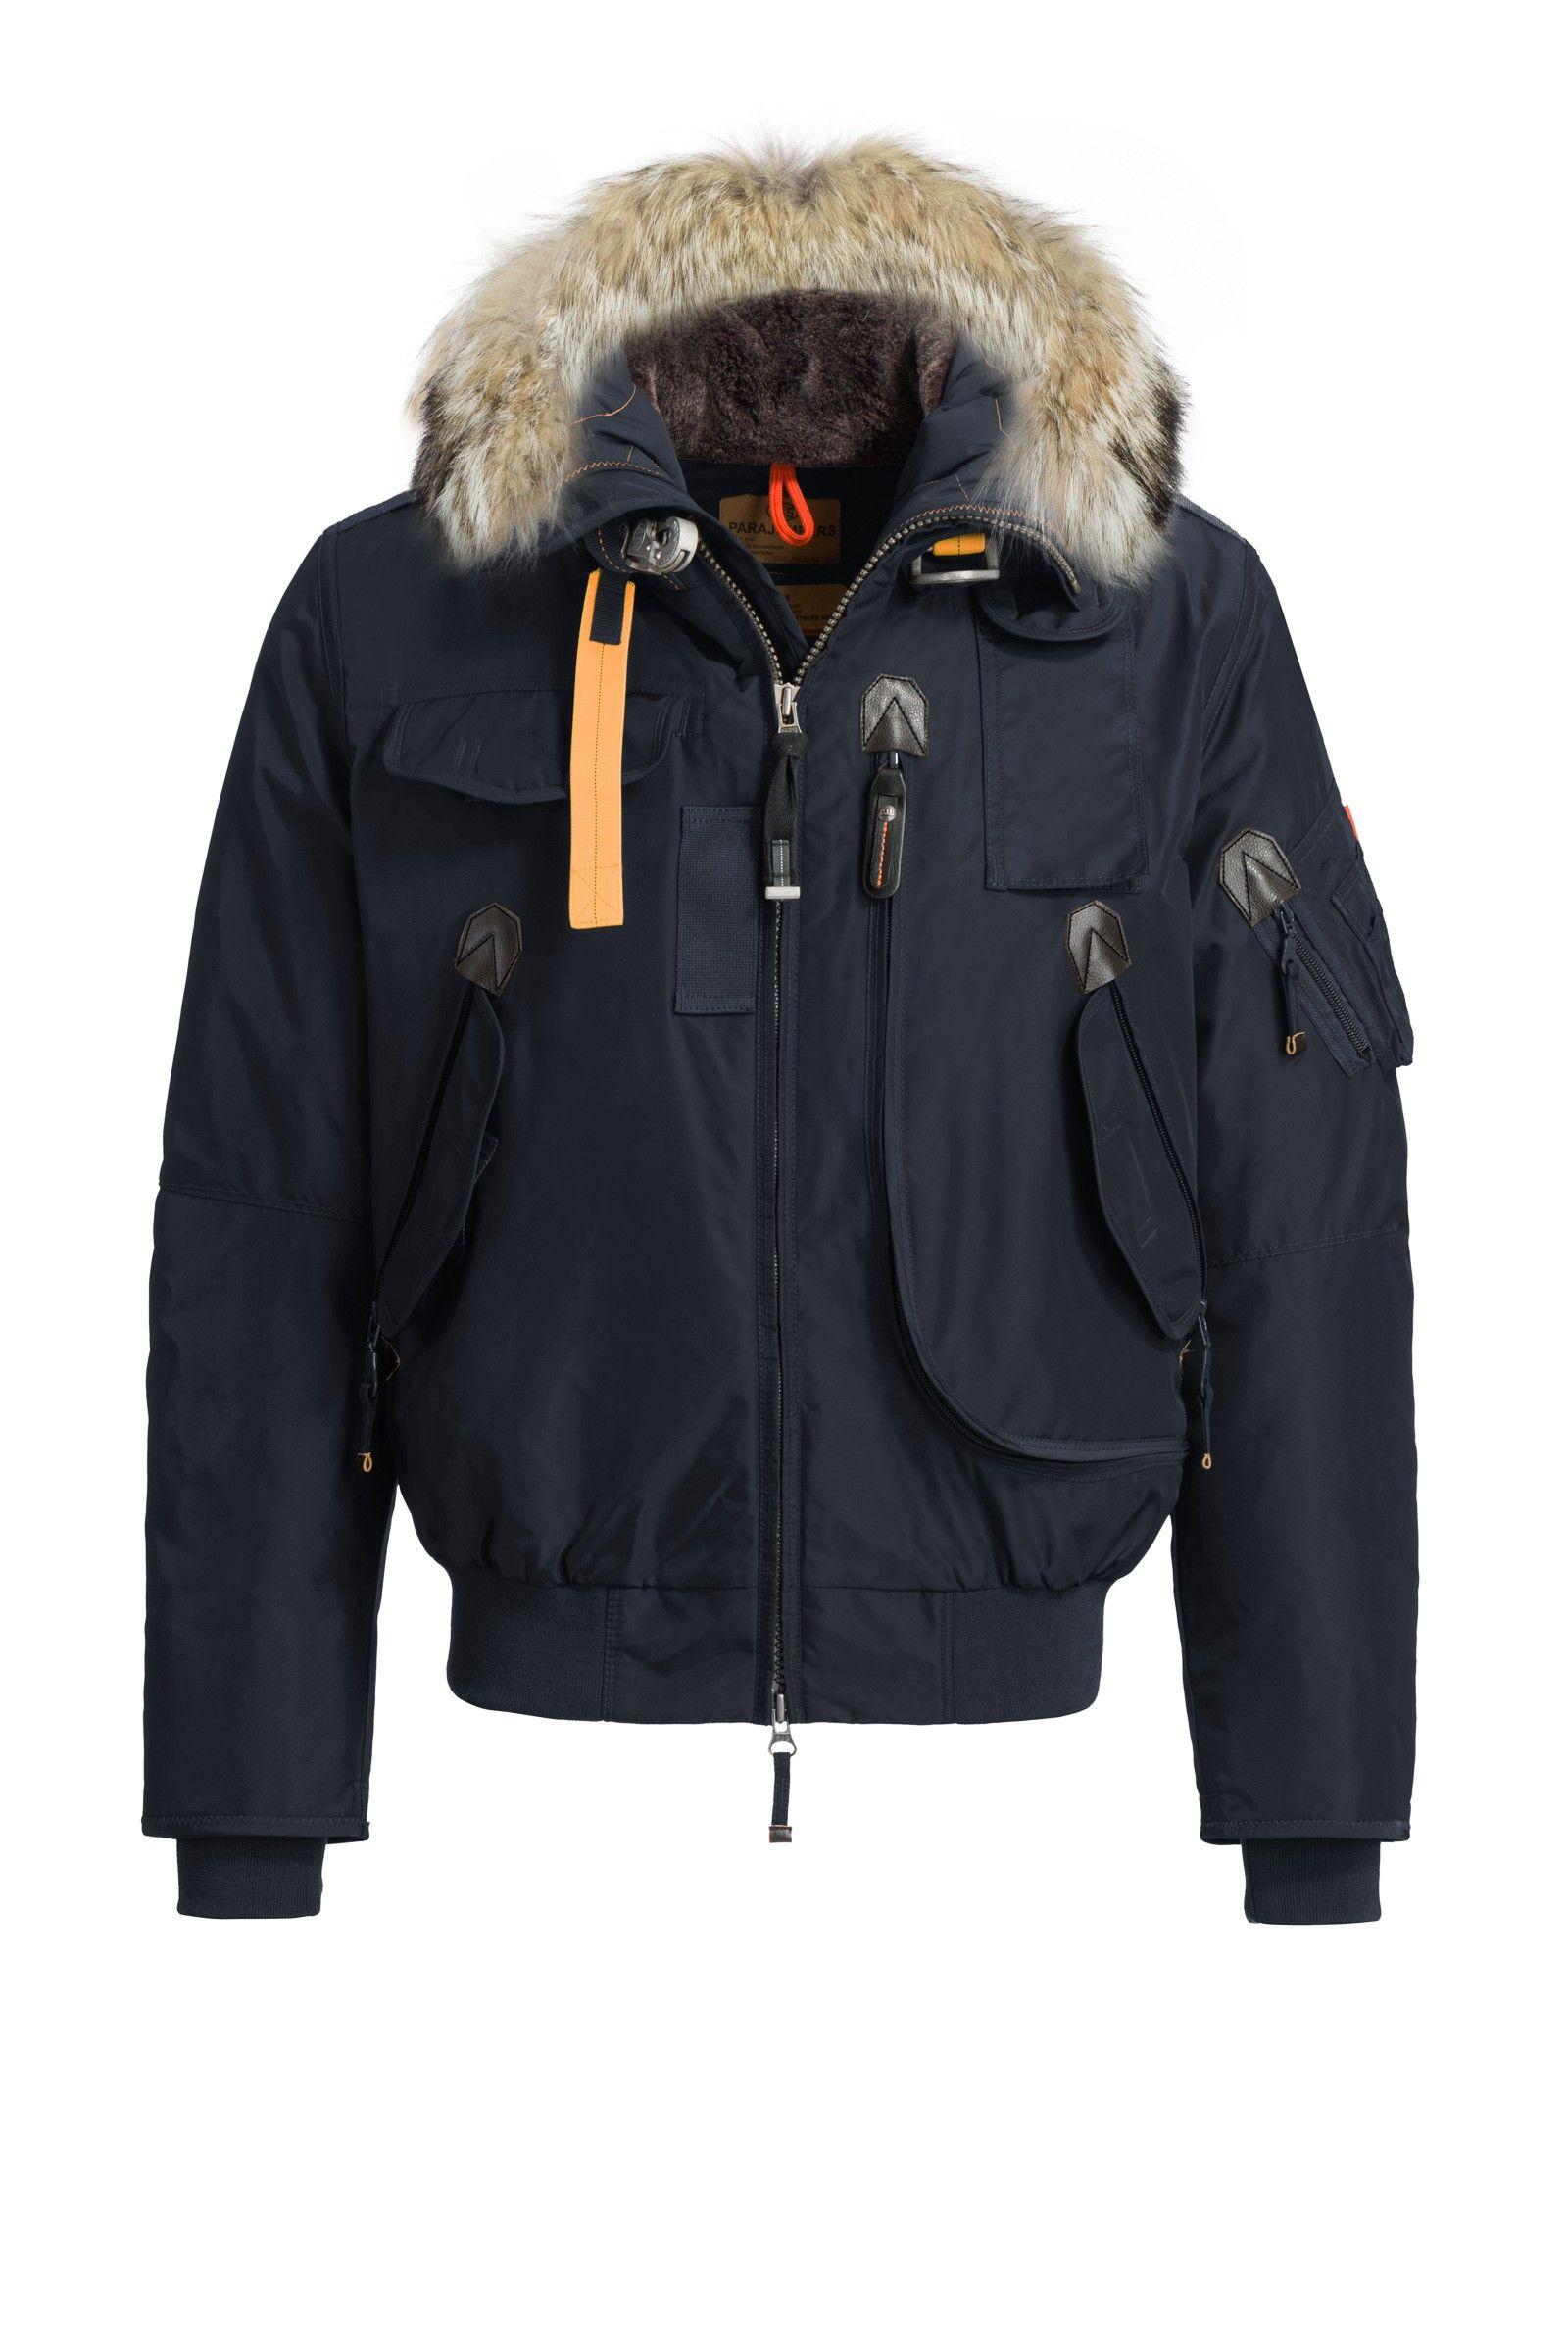 2019 2018 2019 Fast Shipping Top Brand Winter Jacket Men S Gobi Down